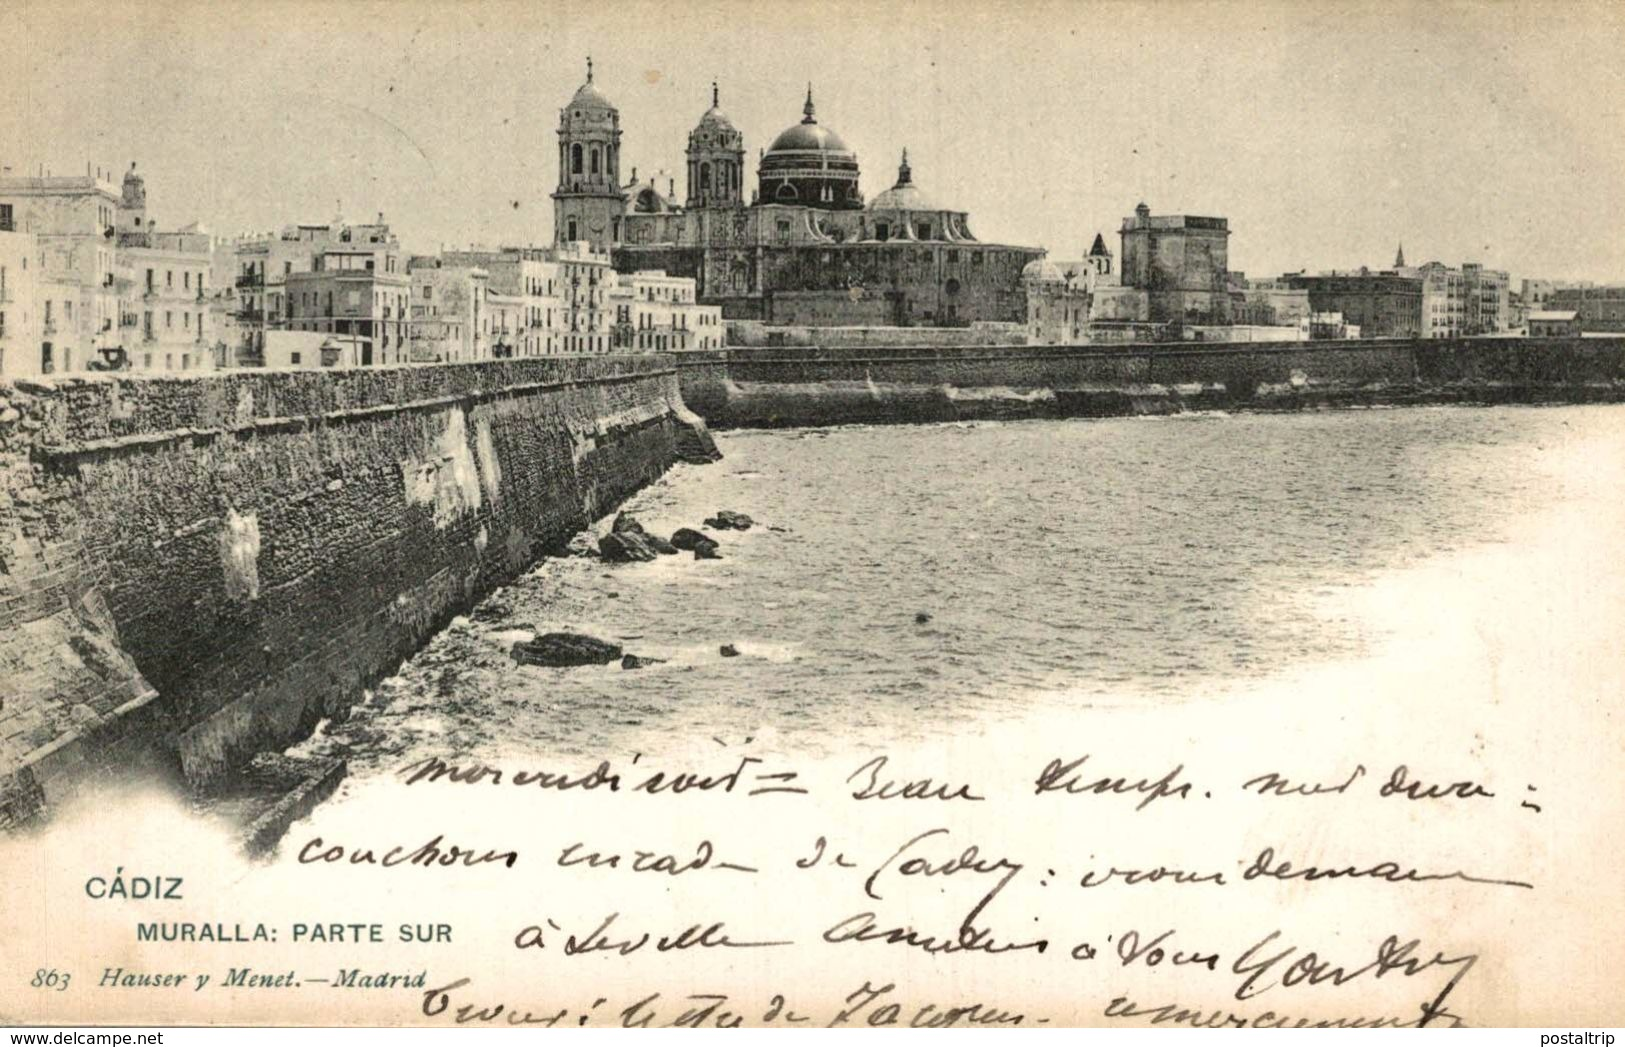 CADIZ. MURALLA PARTE SUR. - HAUSER Y MENET 863 - Cádiz